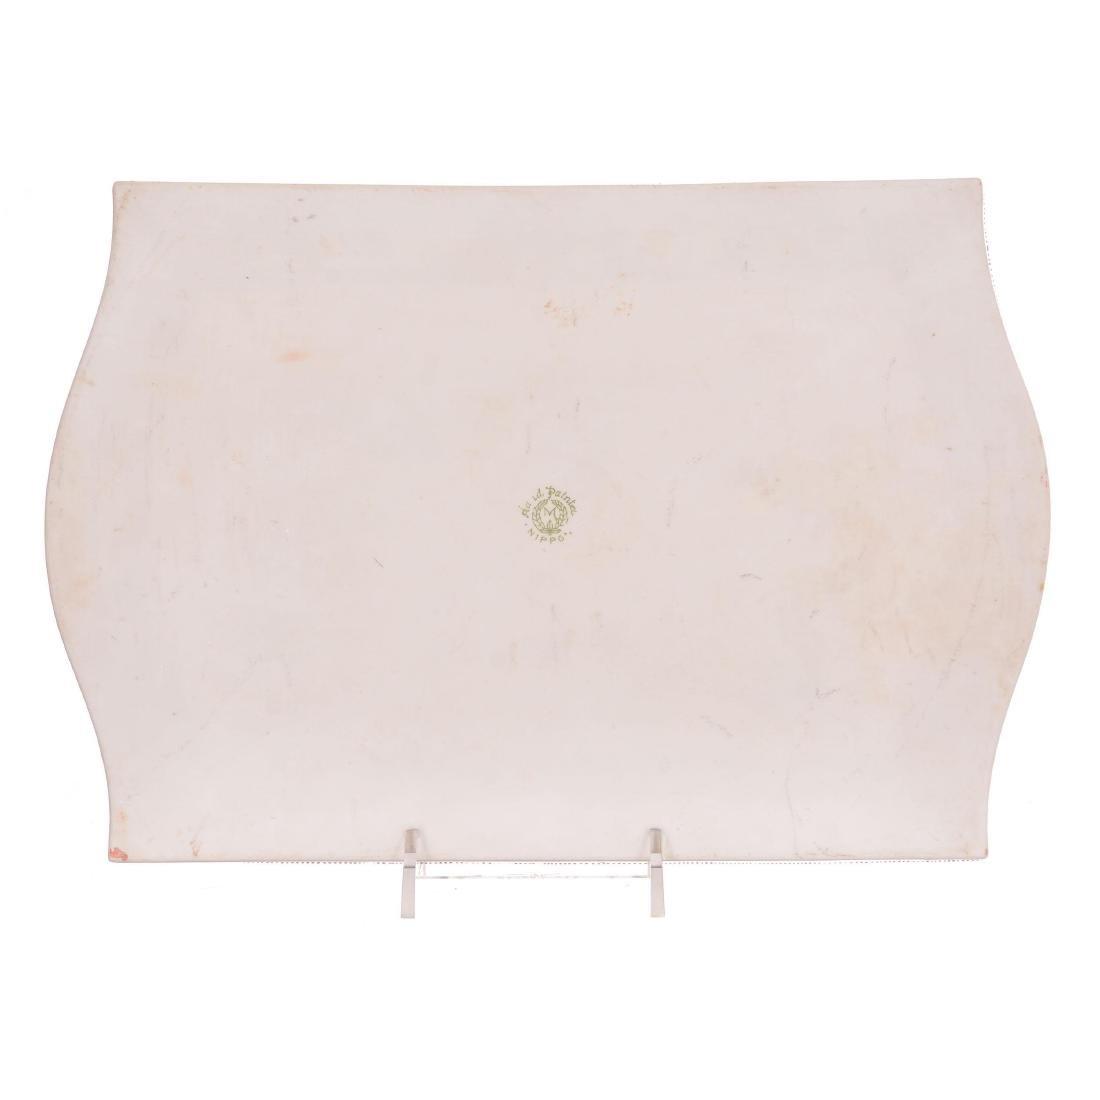 Nippon Dresser Tray/Plaque - 2